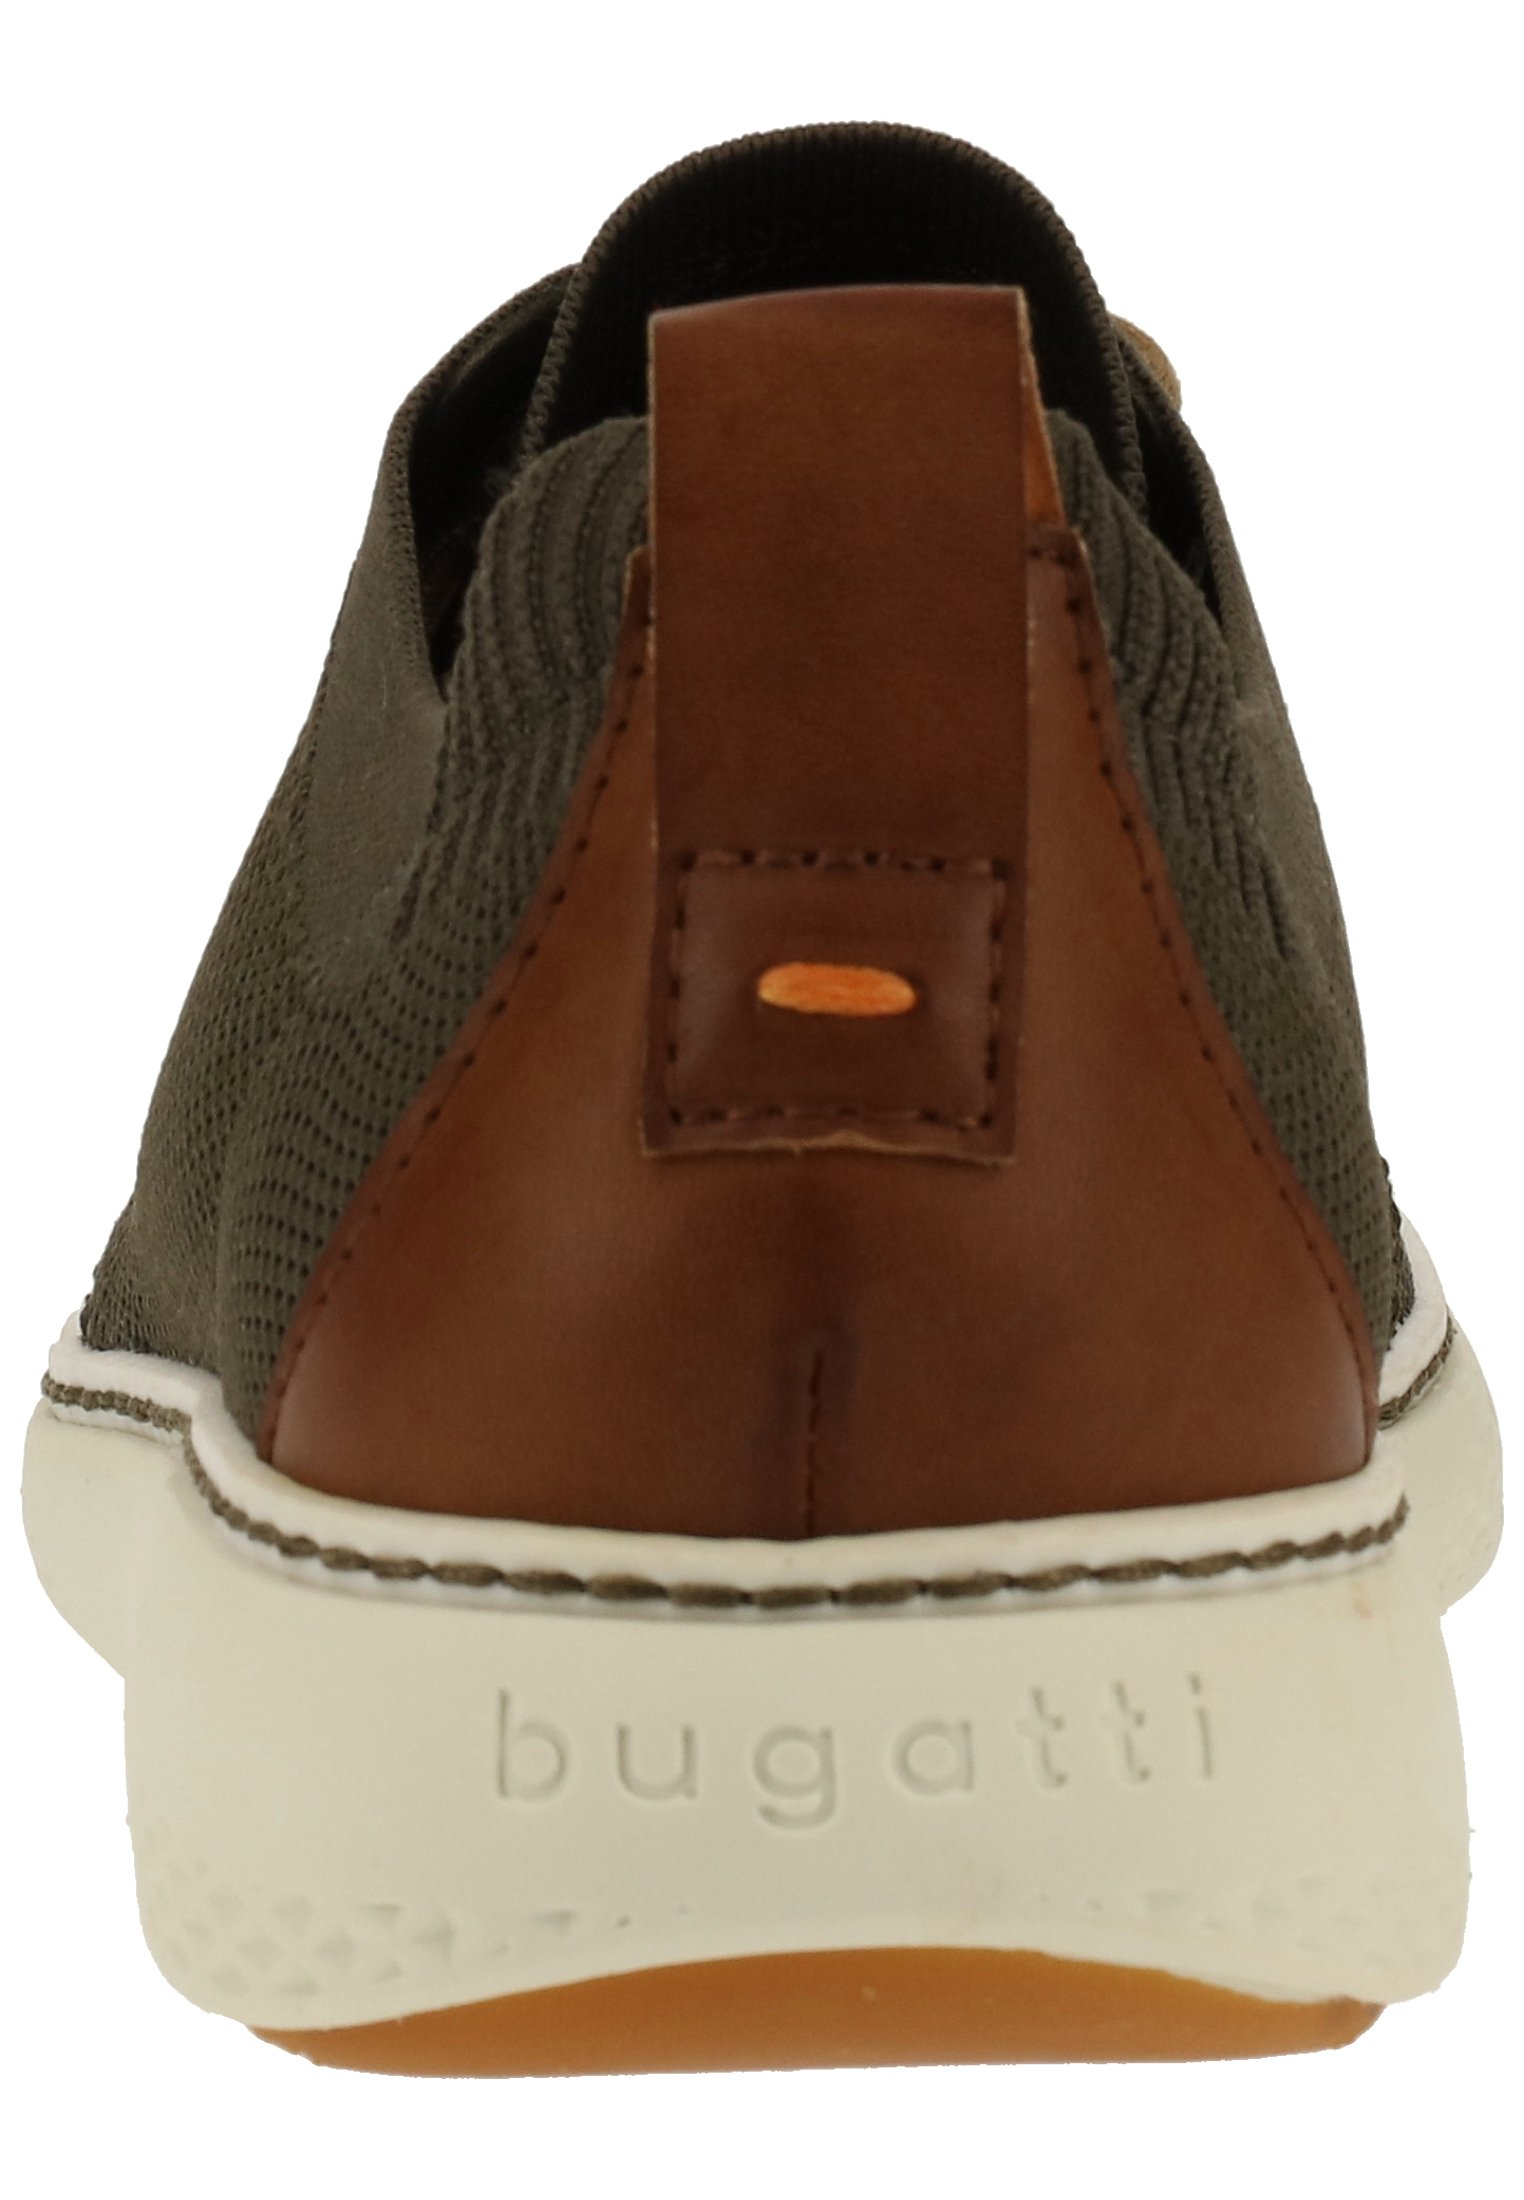 Bugatti Sneakers - Dark Green